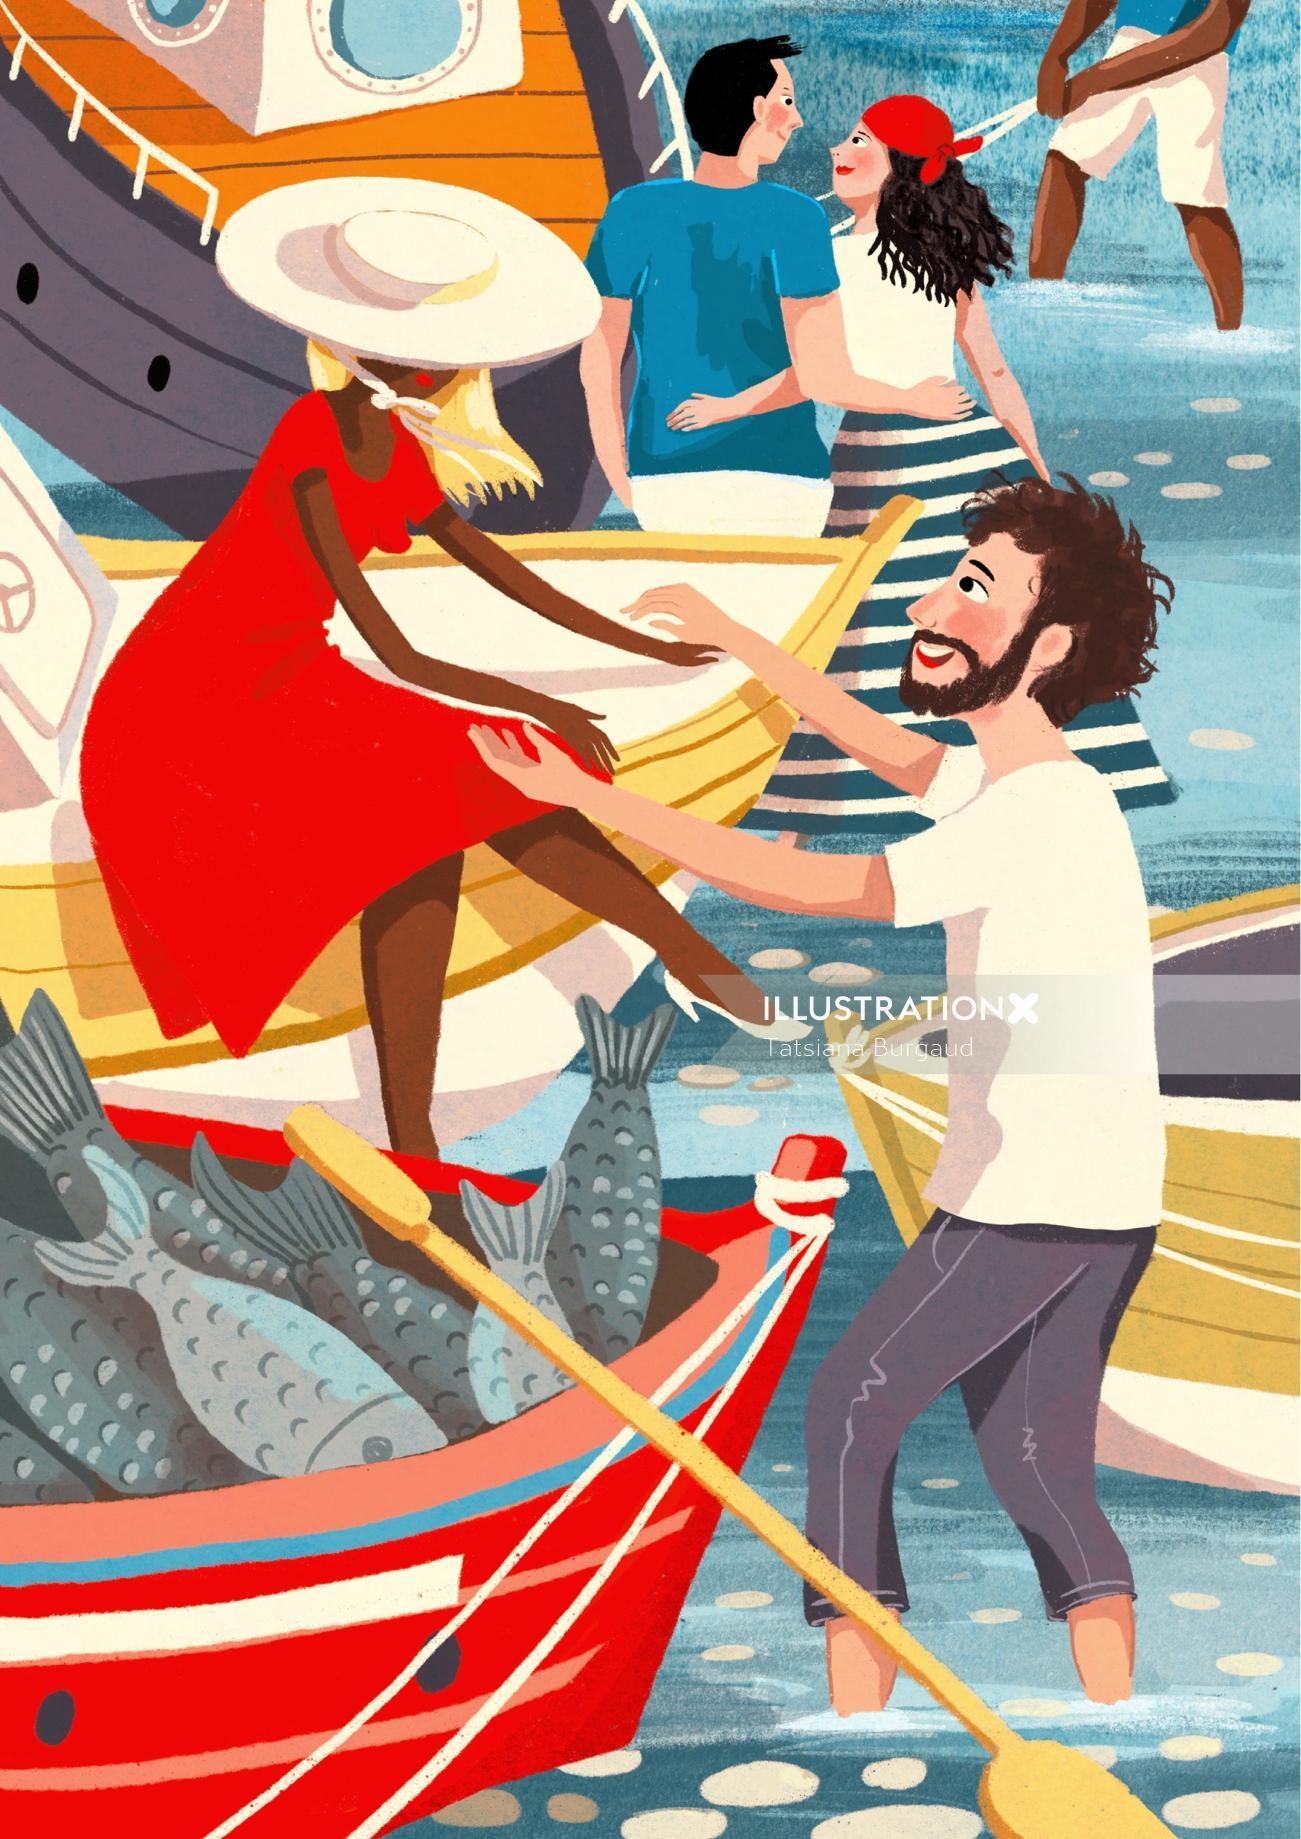 woman man, love, emotion, marina, boat, tourism